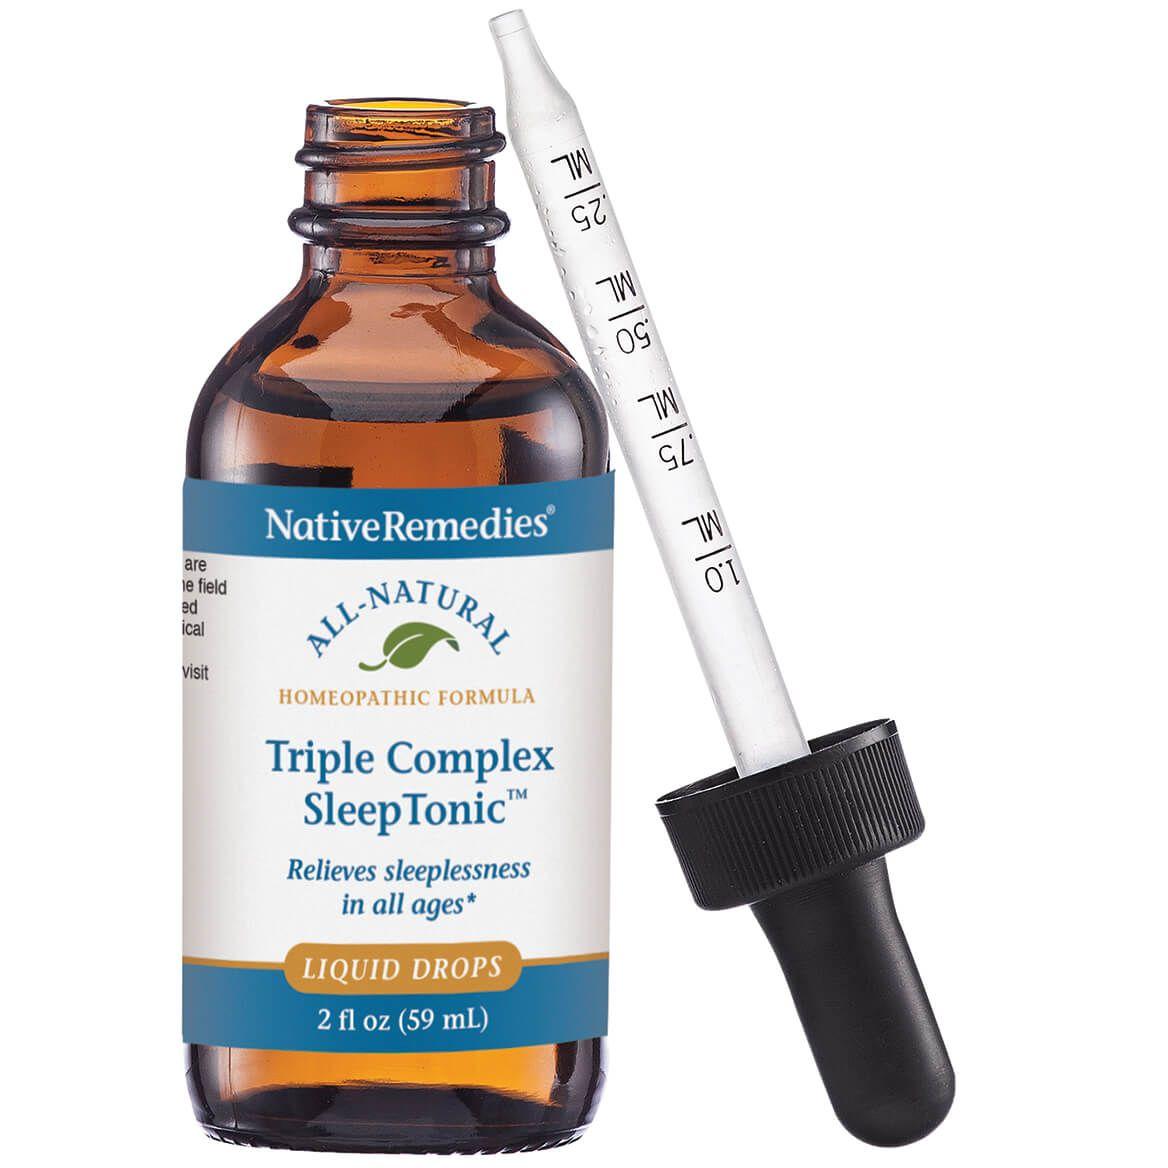 NativeRemedies® Triple Complex Sleep Tonic™-350103